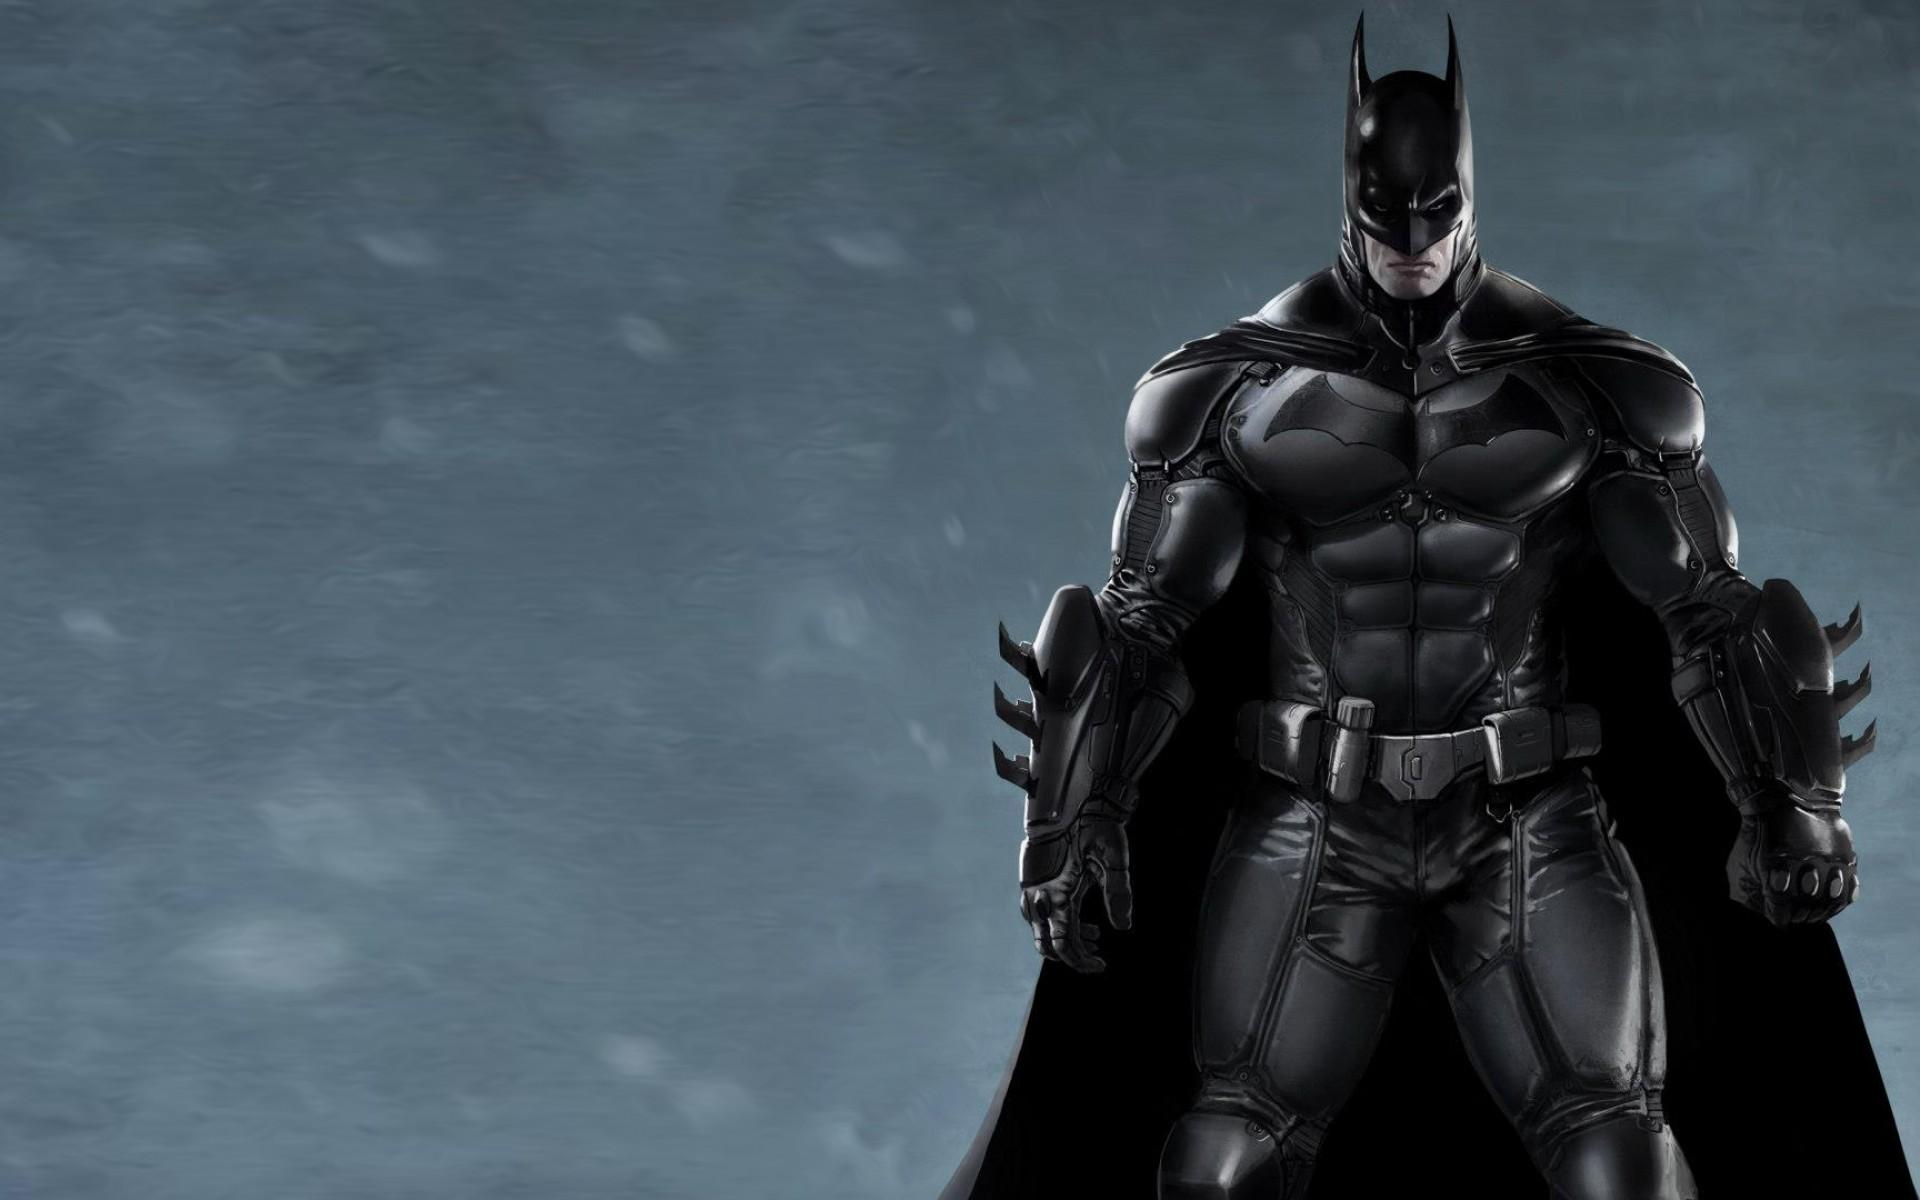 Cool Batman Pose Wallpaper Movie #6141 Wallpaper | Wallpaper Screen ...